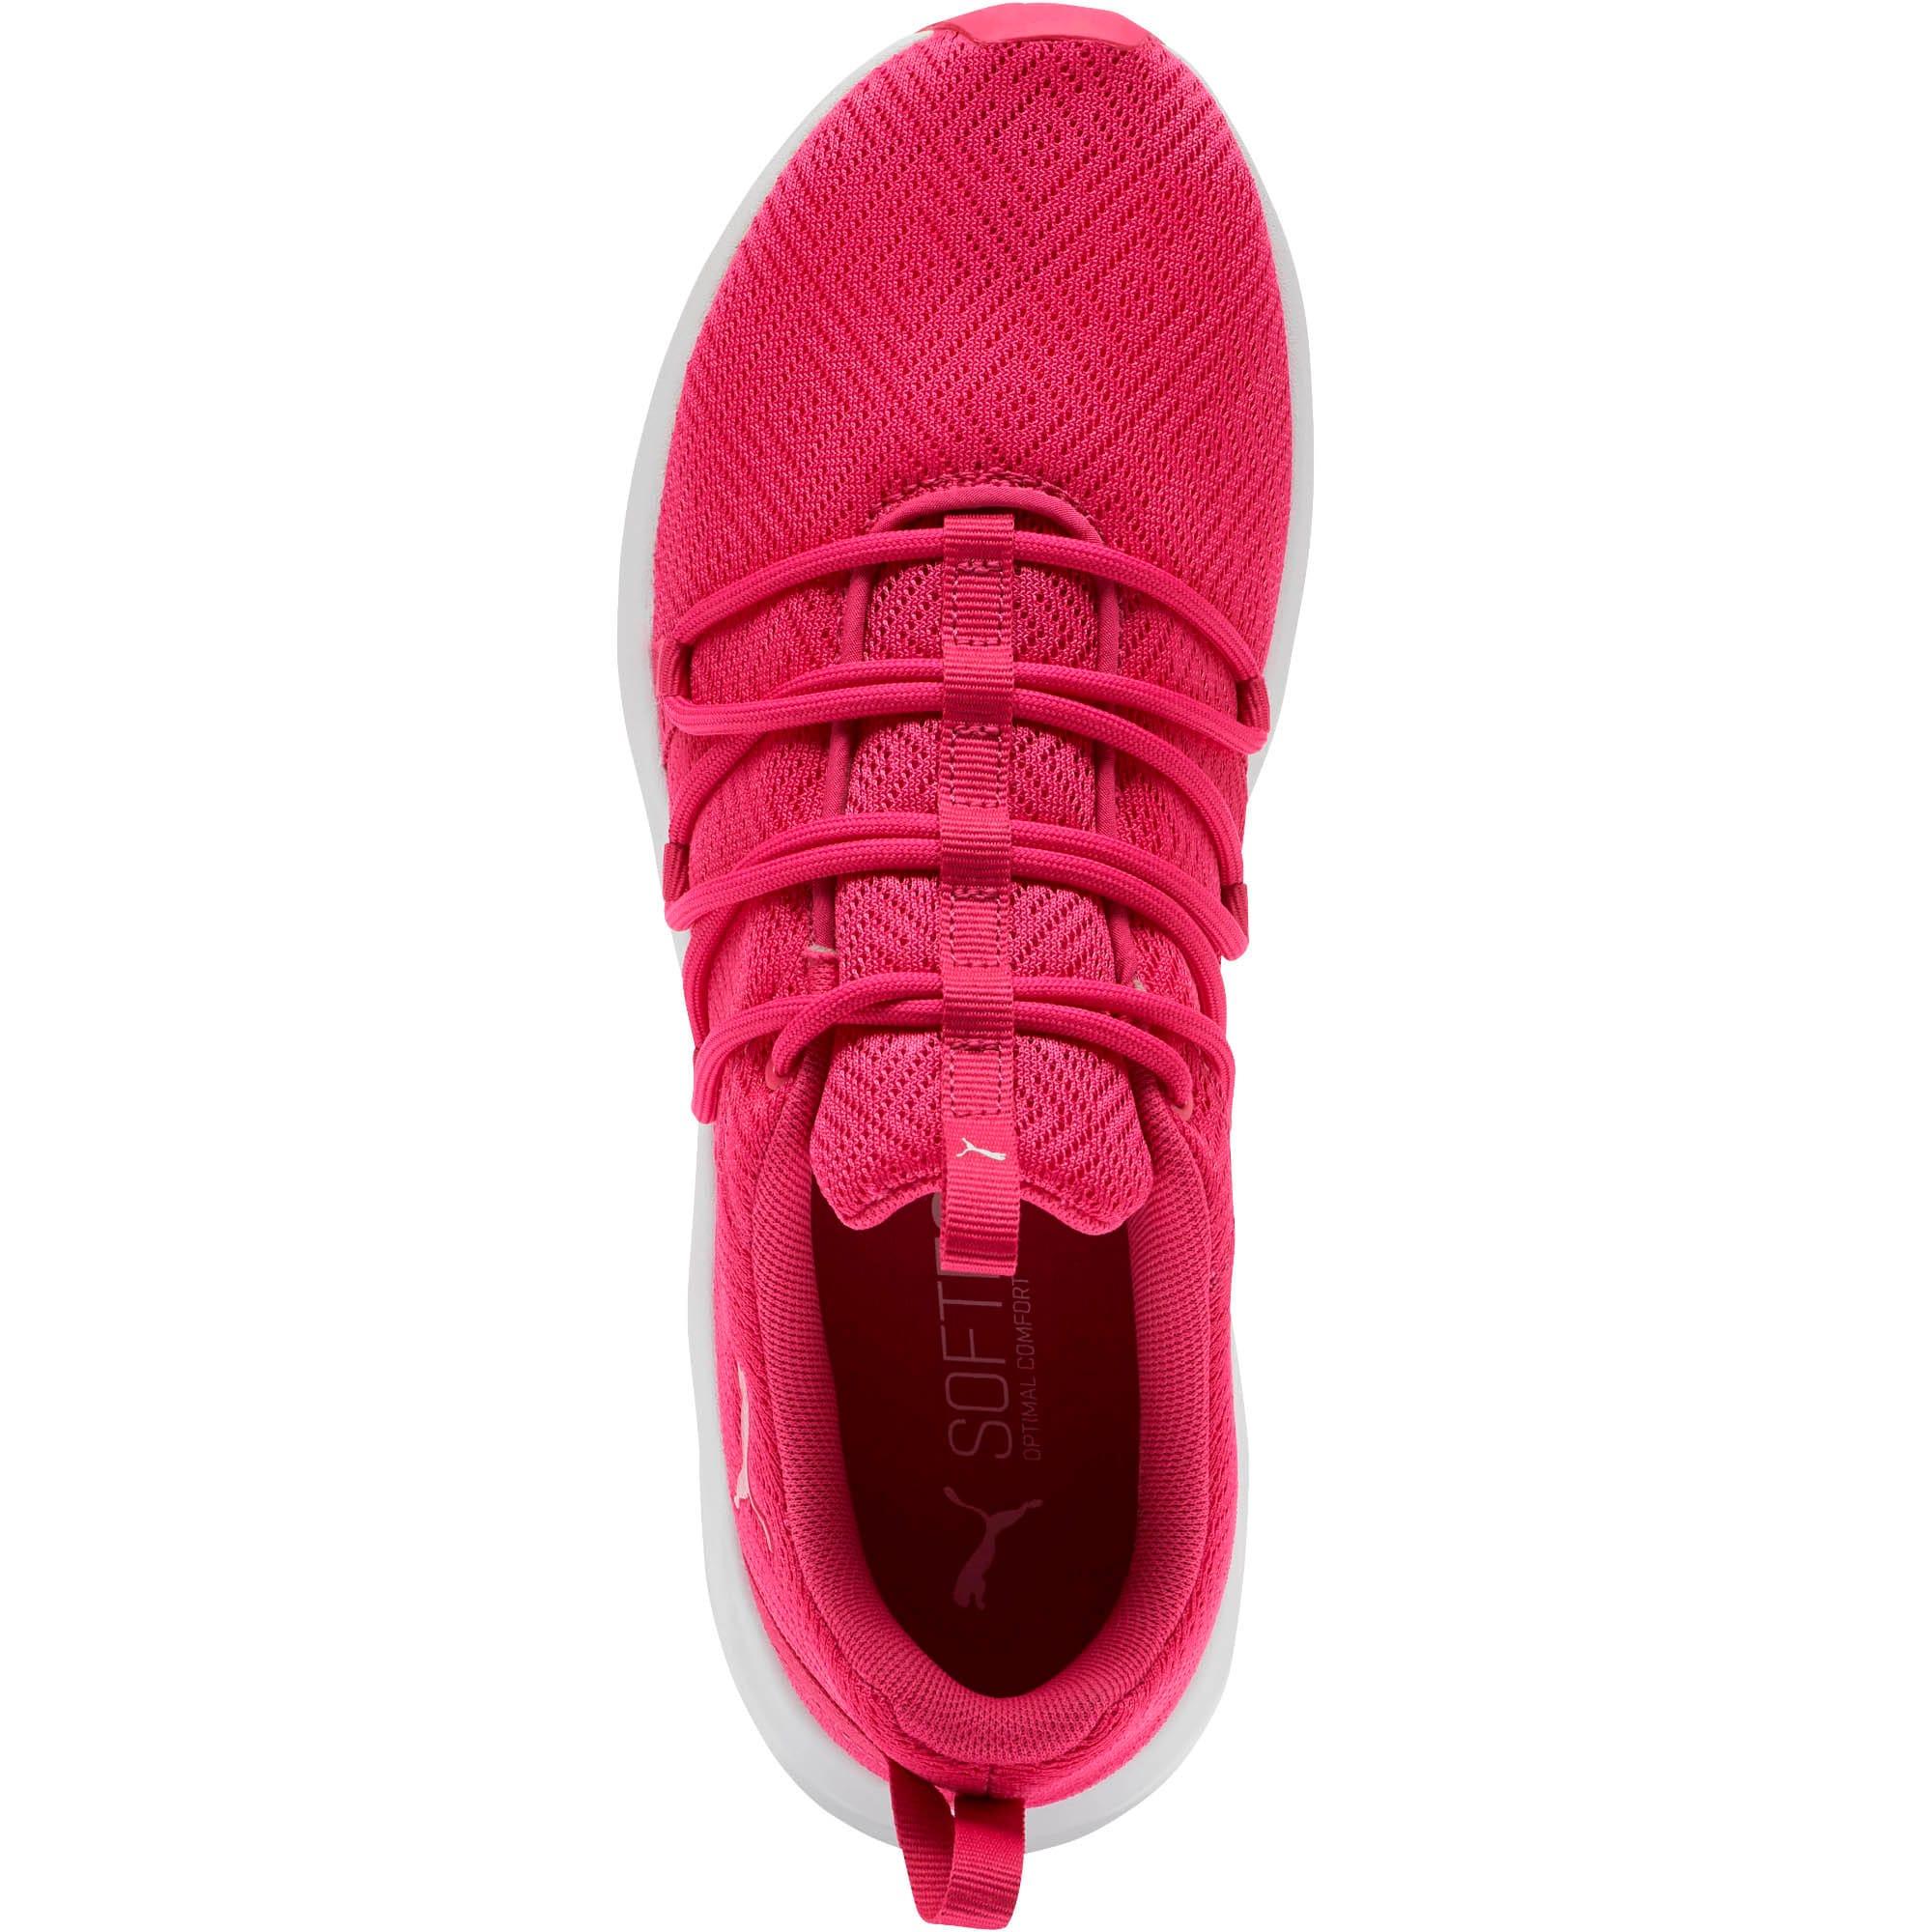 Thumbnail 5 of Prowl Alt Stellar Women's Training Shoes, Fuchsia Purple-Puma White, medium